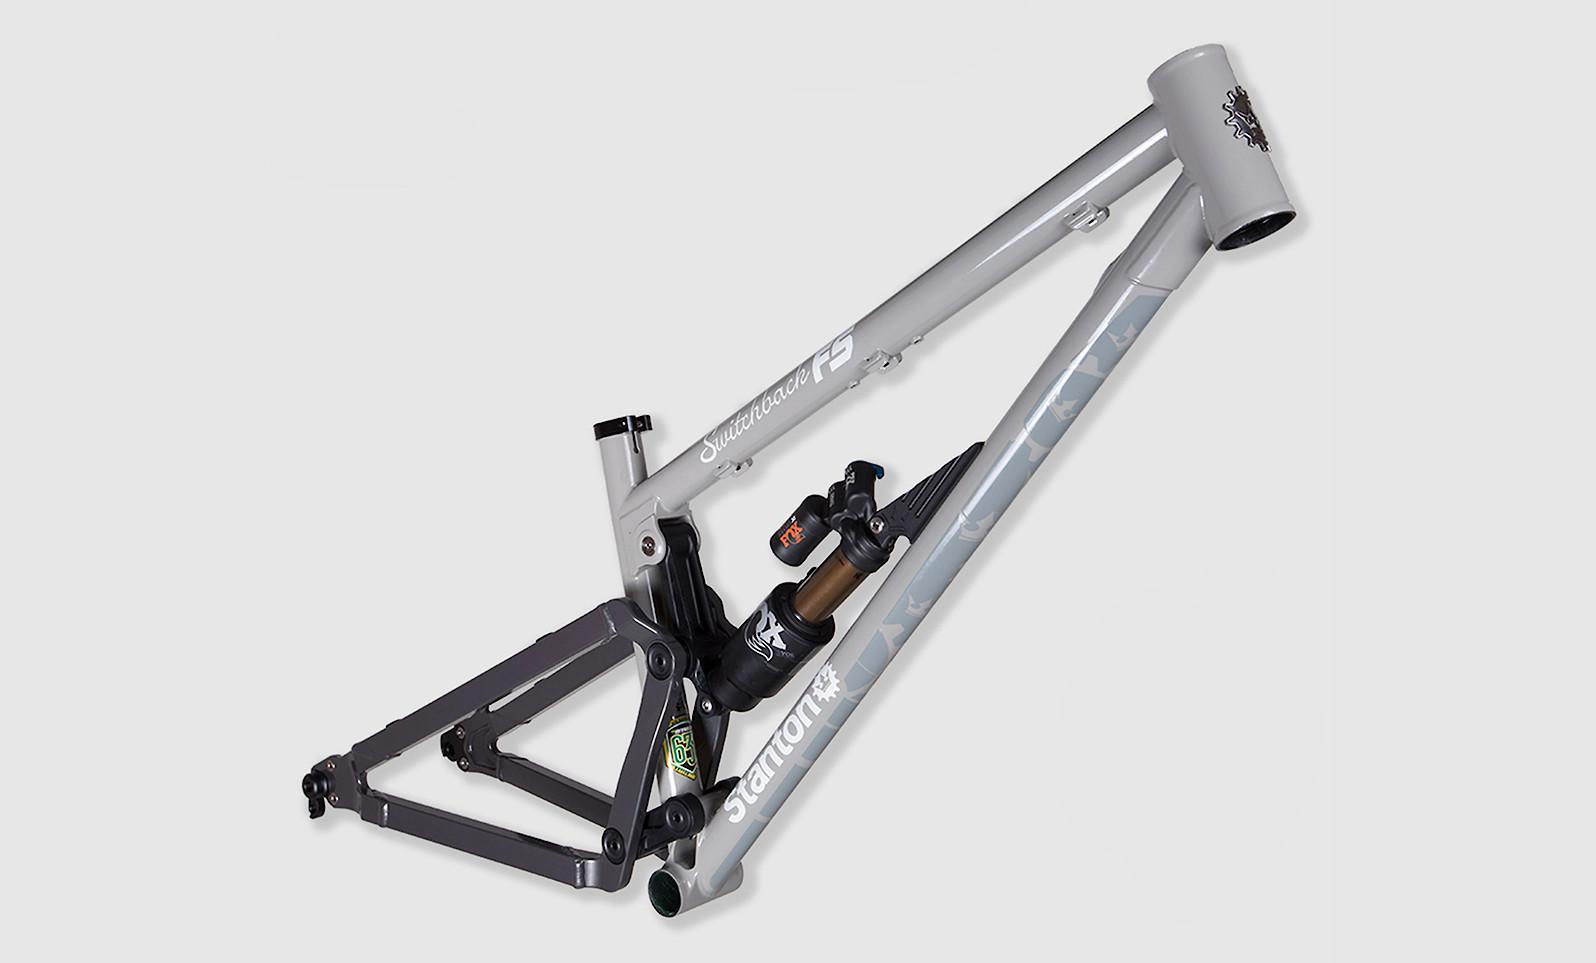 Stanton Switchback FS 160 Frame